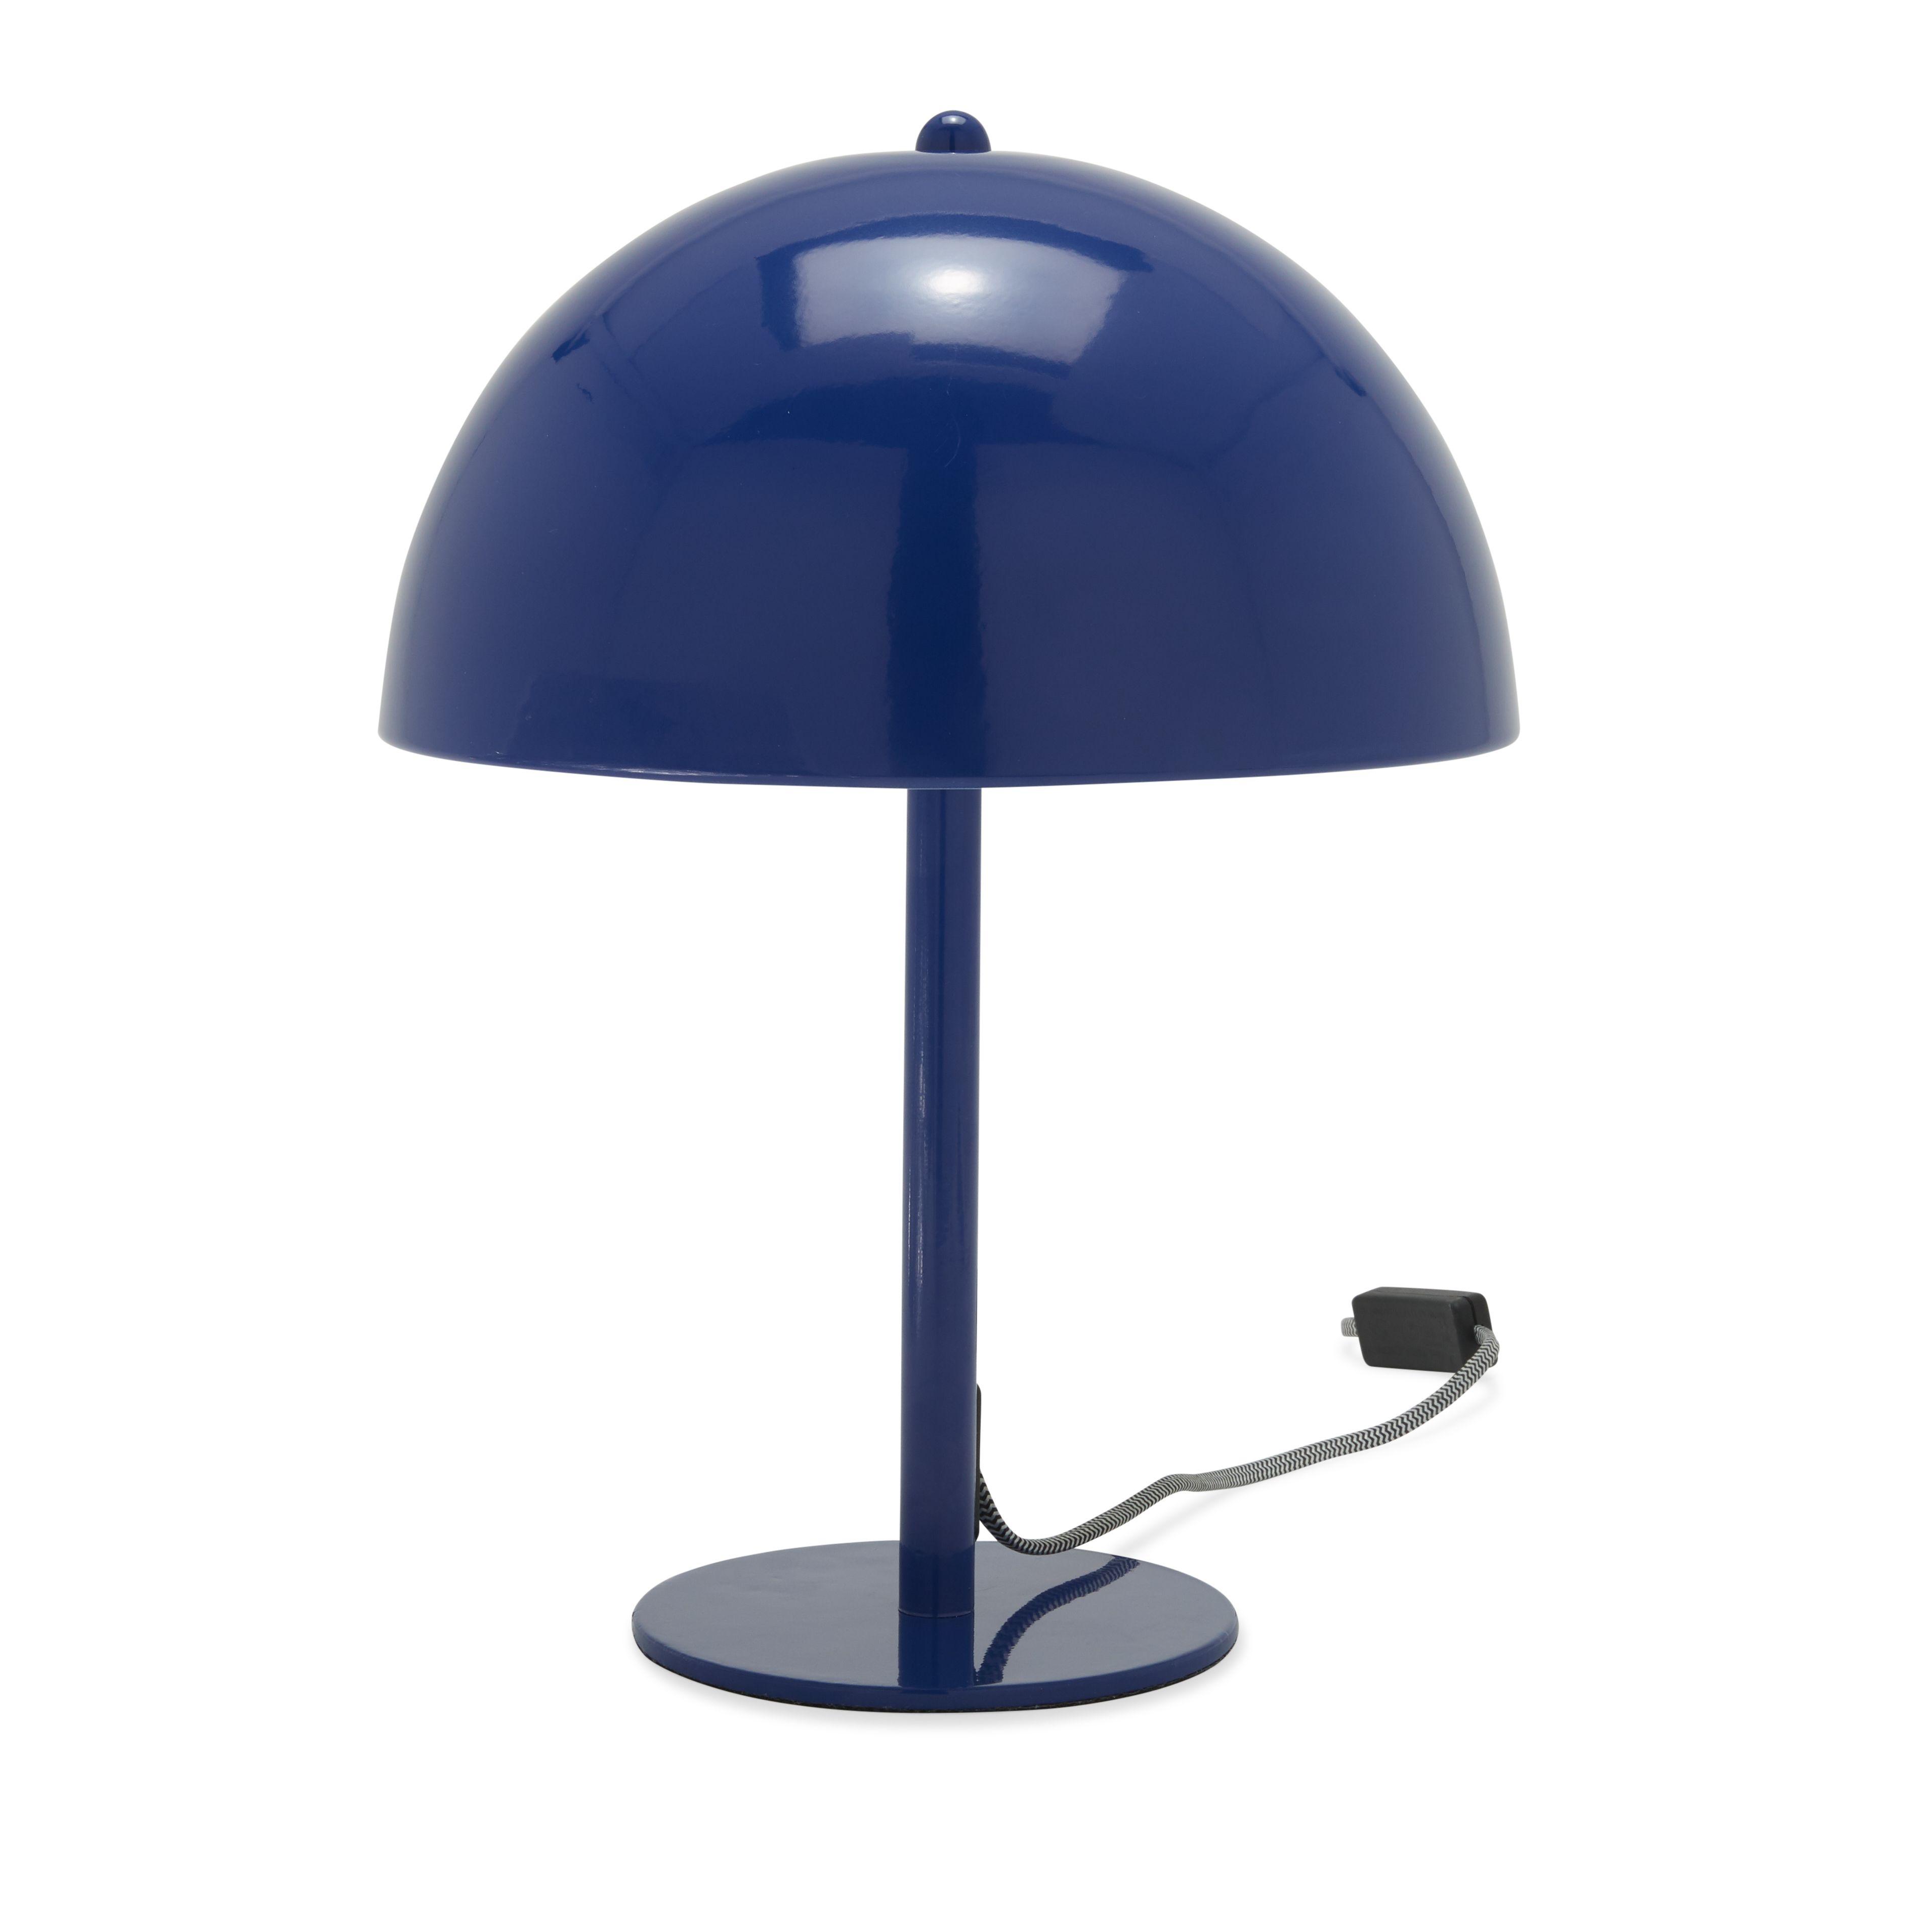 Grecian Blue Retro Table Light by Drew Barrymore Flower